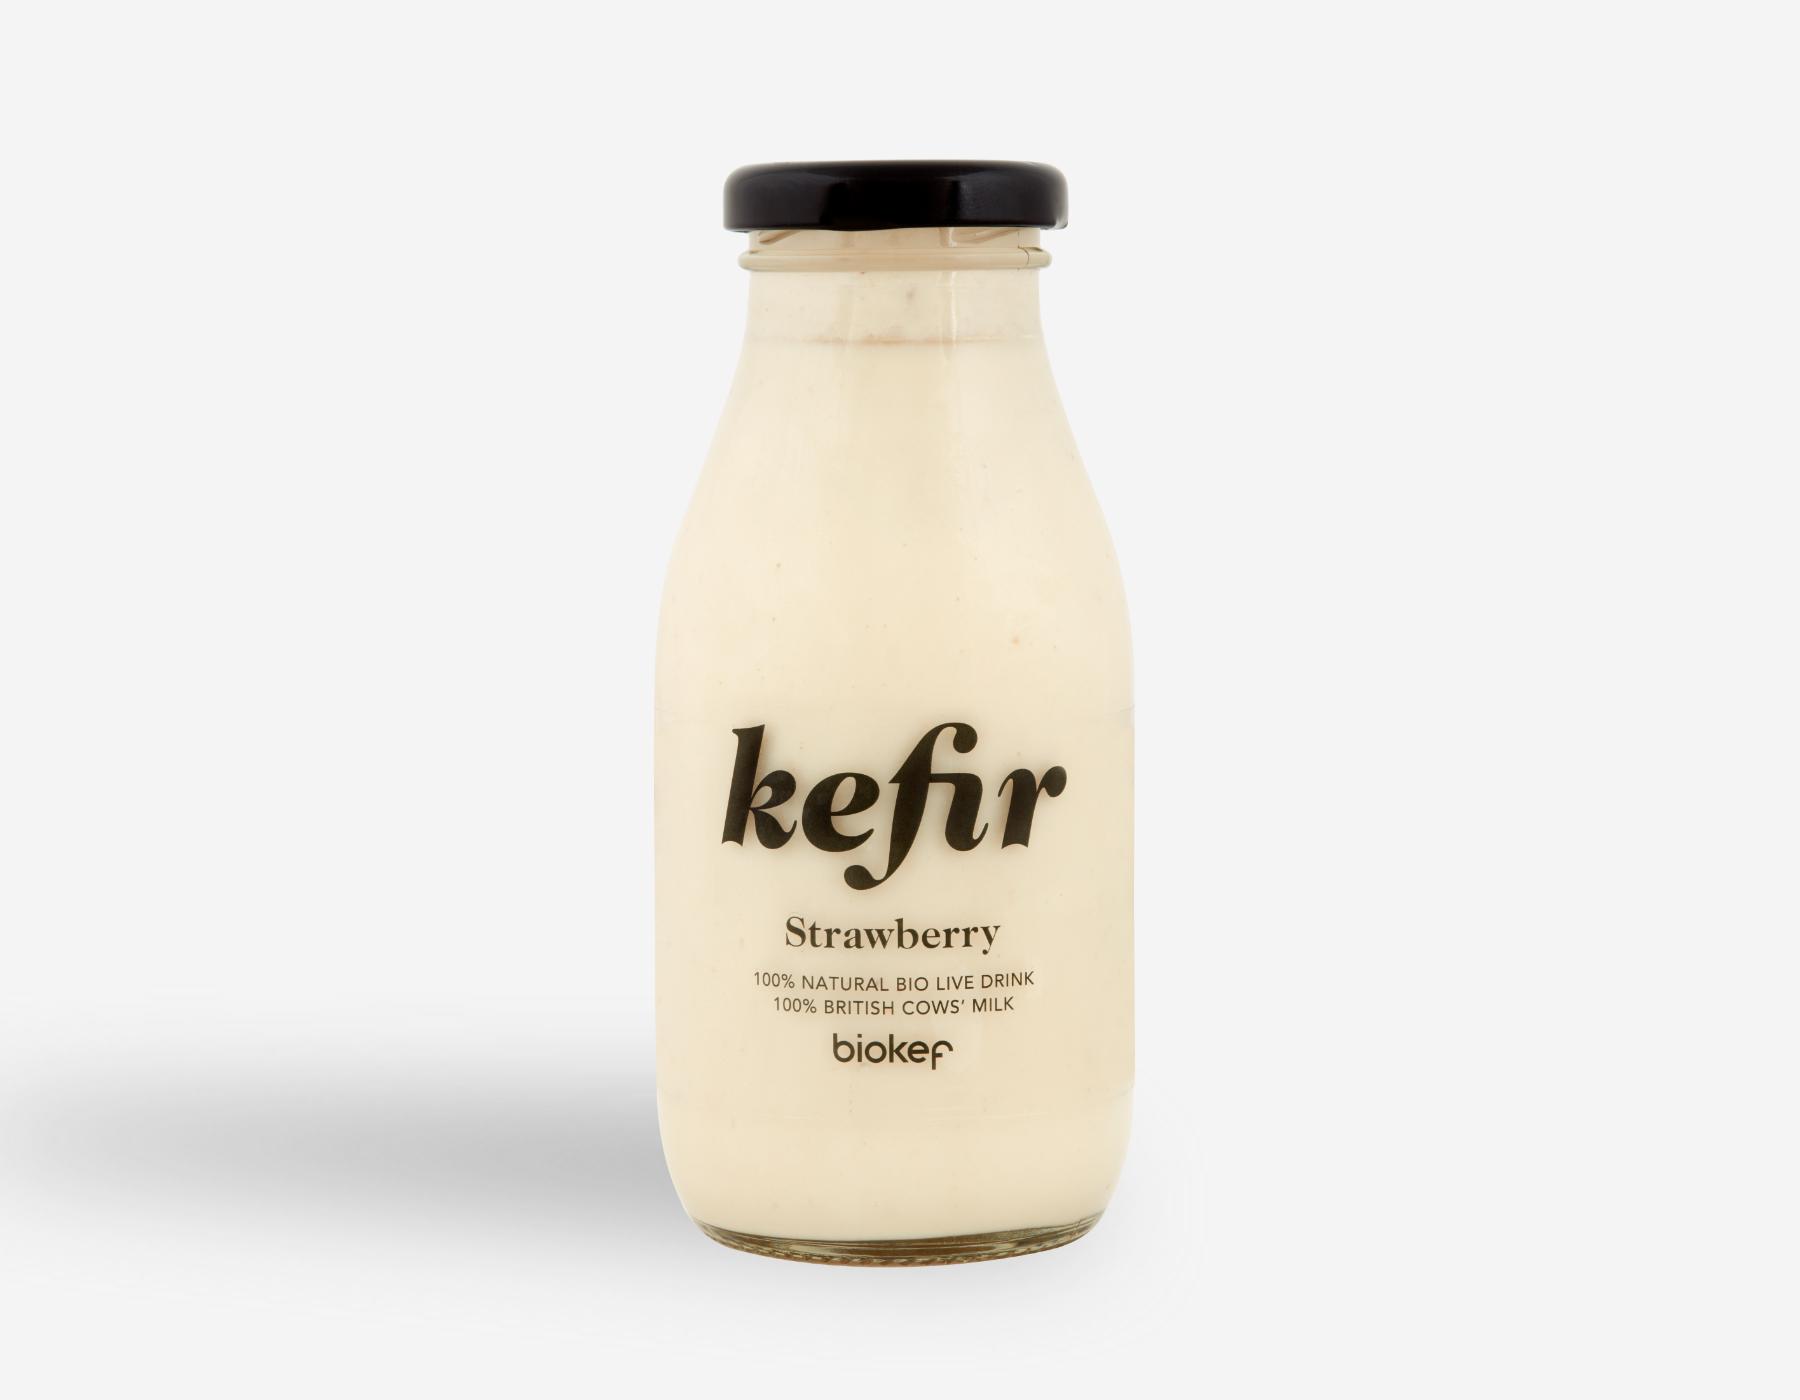 Biokef Kefir Jersey Cows and Goats Milk